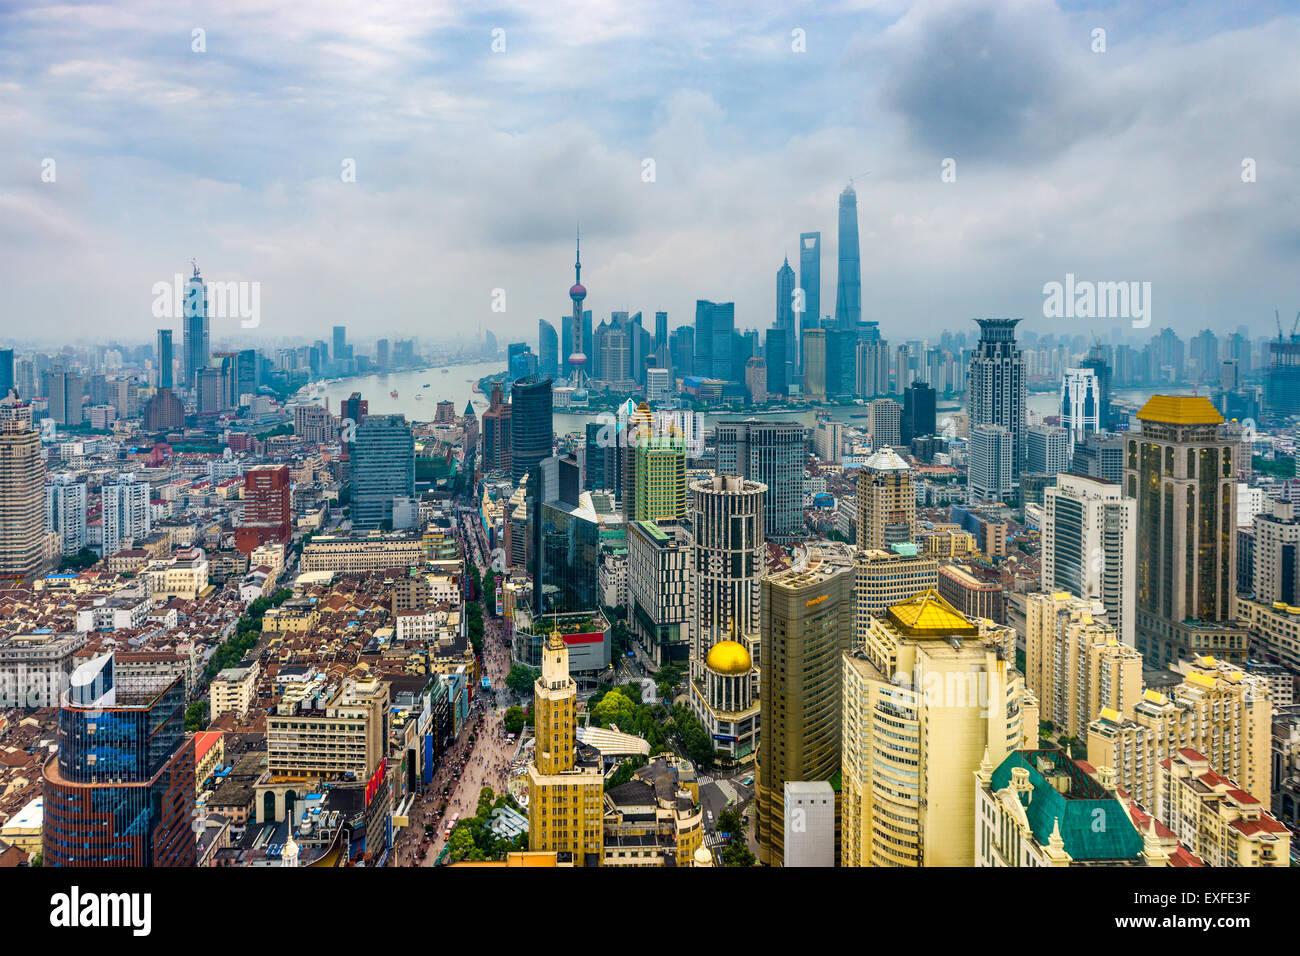 Shanghai, Cina skyline di antenna. Immagini Stock